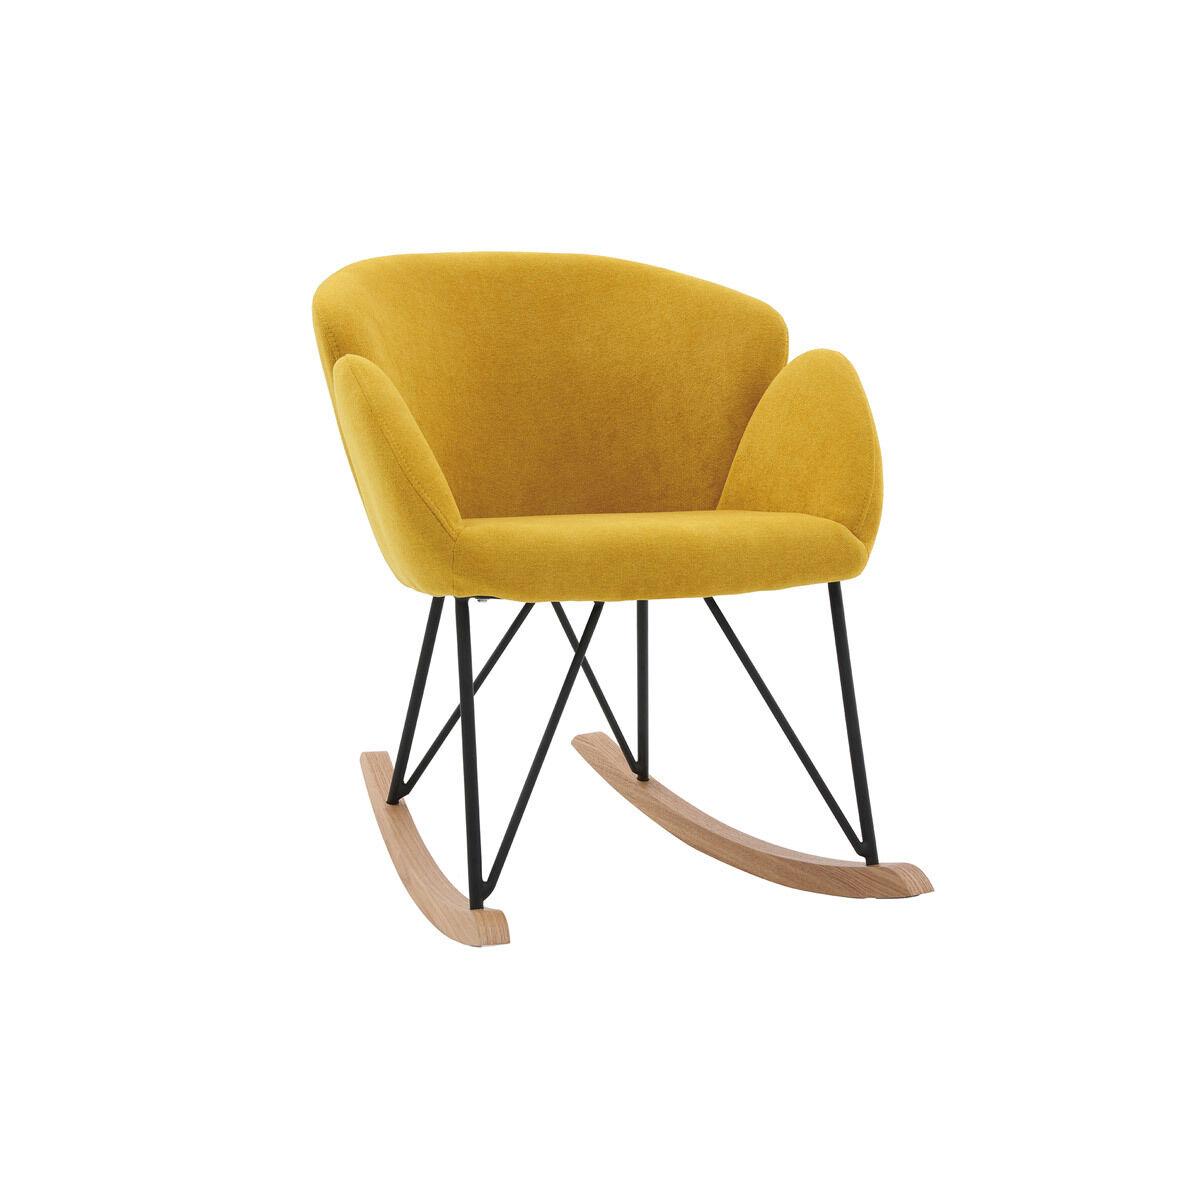 Miliboo Rocking chair design velours jaune moutarde RHAPSODY - Miliboo & Stéphane Plaza